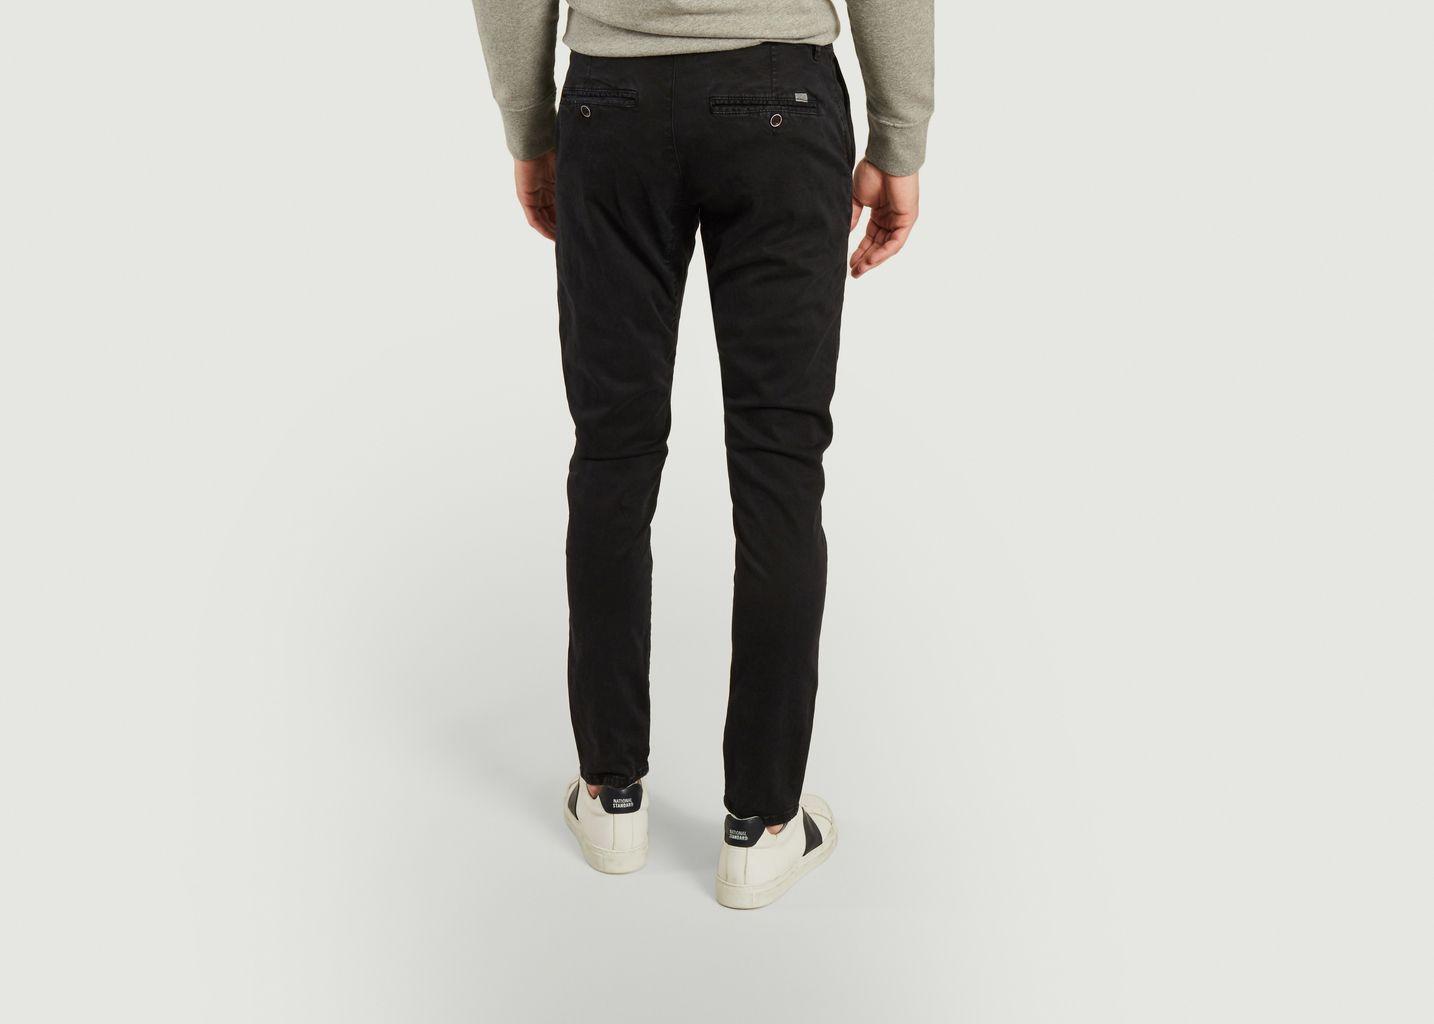 Pantalon Dening Chino - PULLIN